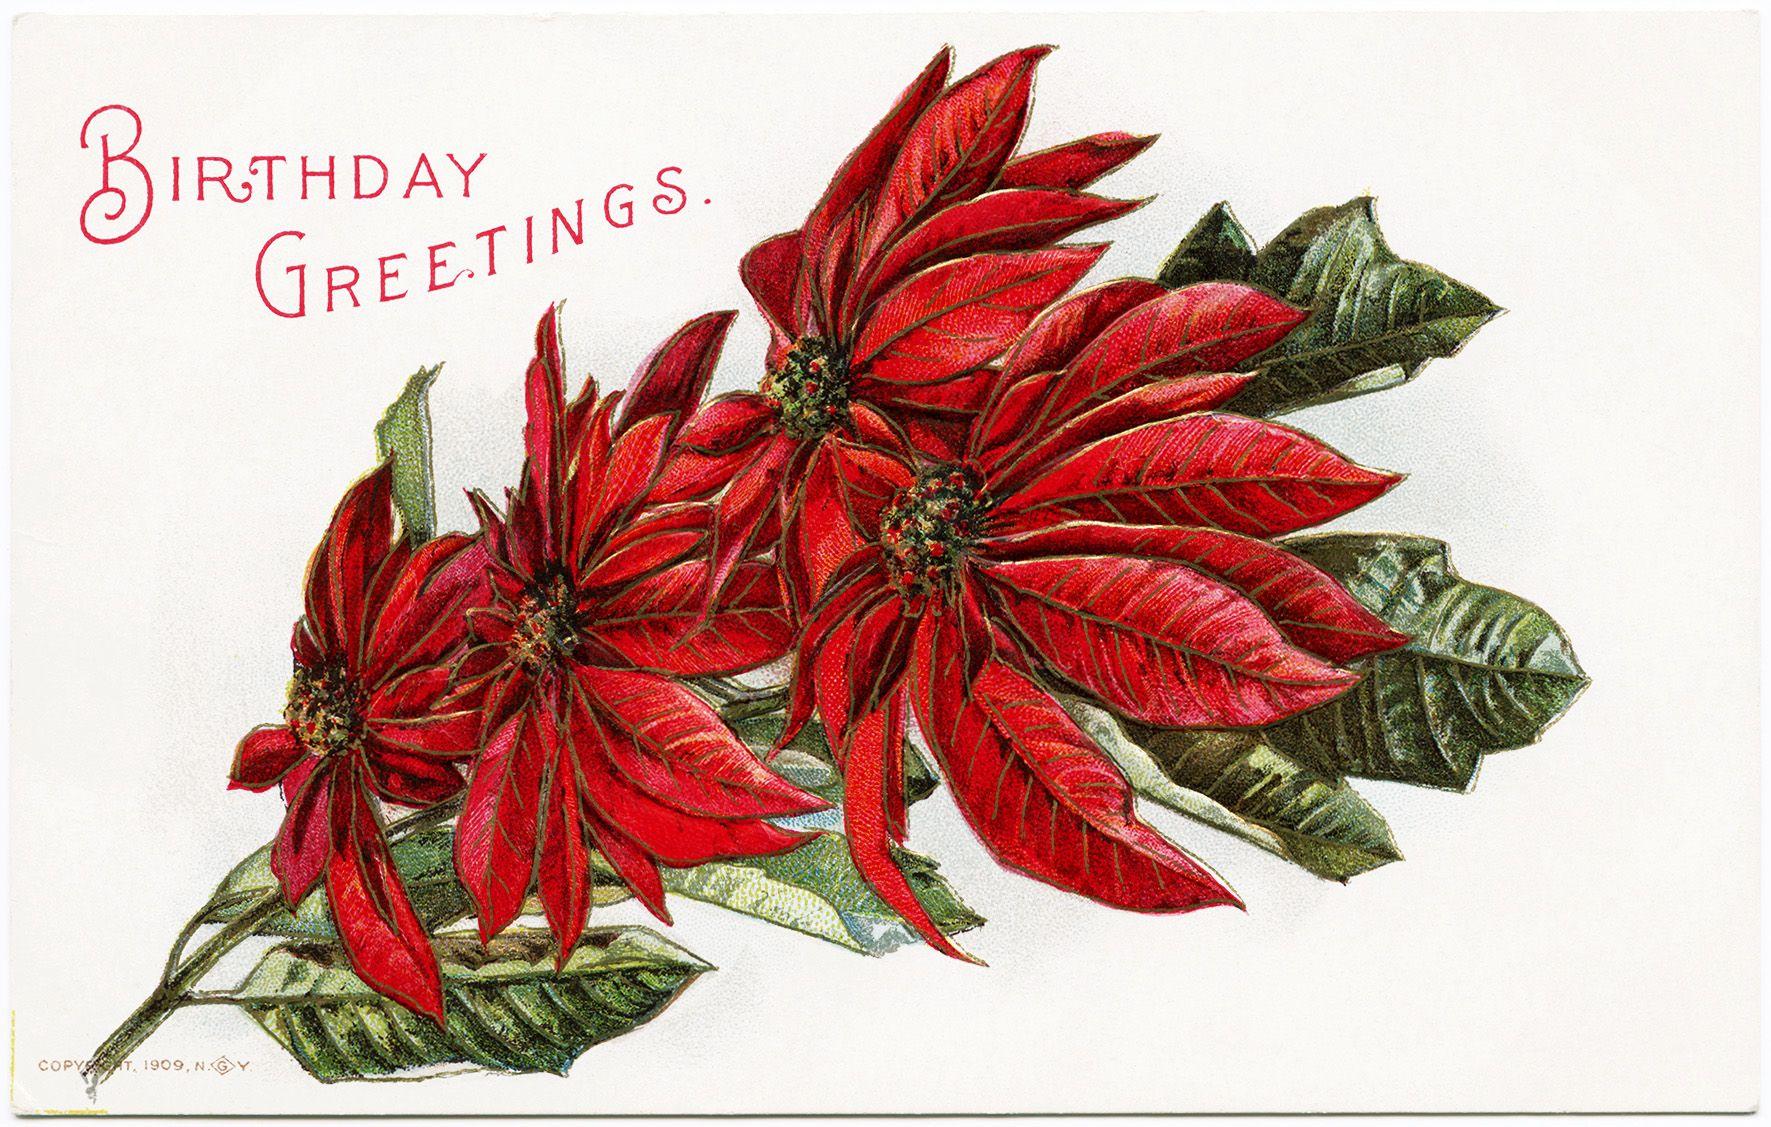 Vintage Birthday Cards Free For December Birthdays Vintage